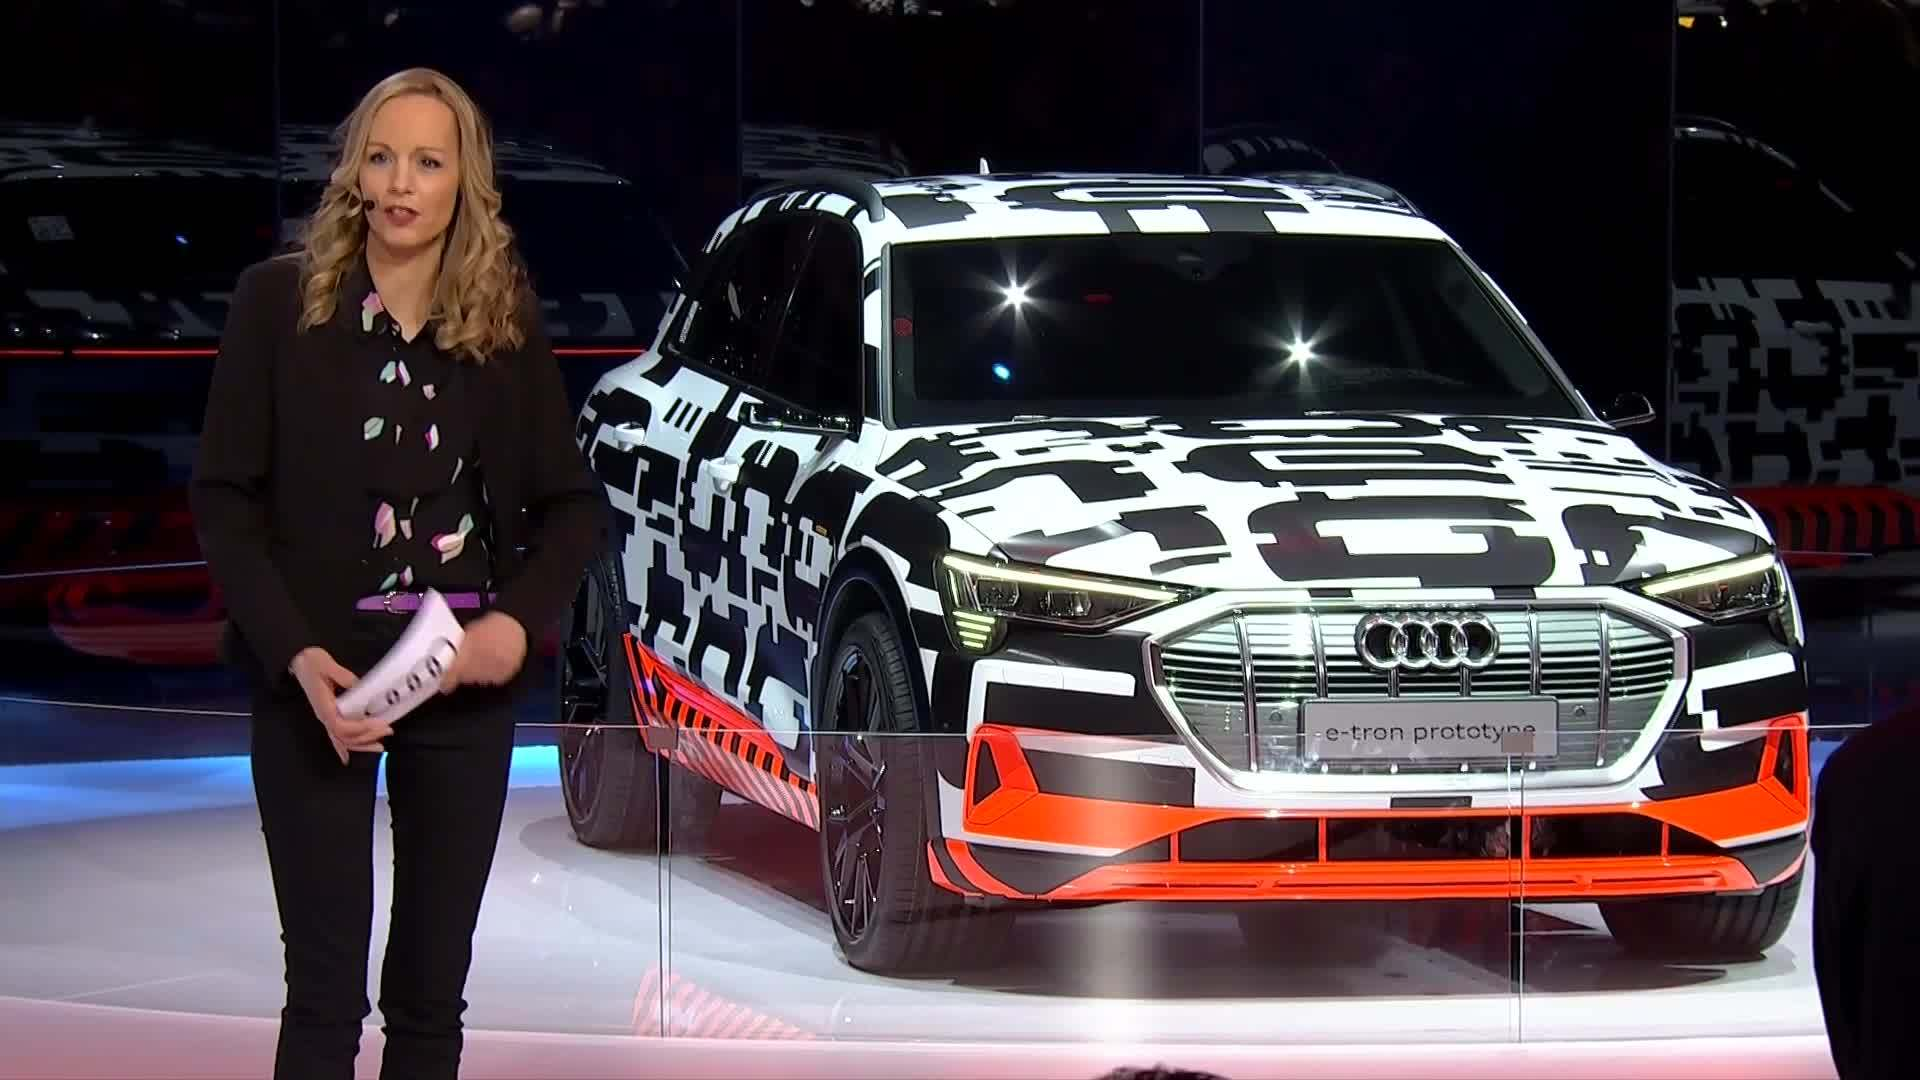 Audi A6 and Audi e-tron prototype at the Geneva Motor Show